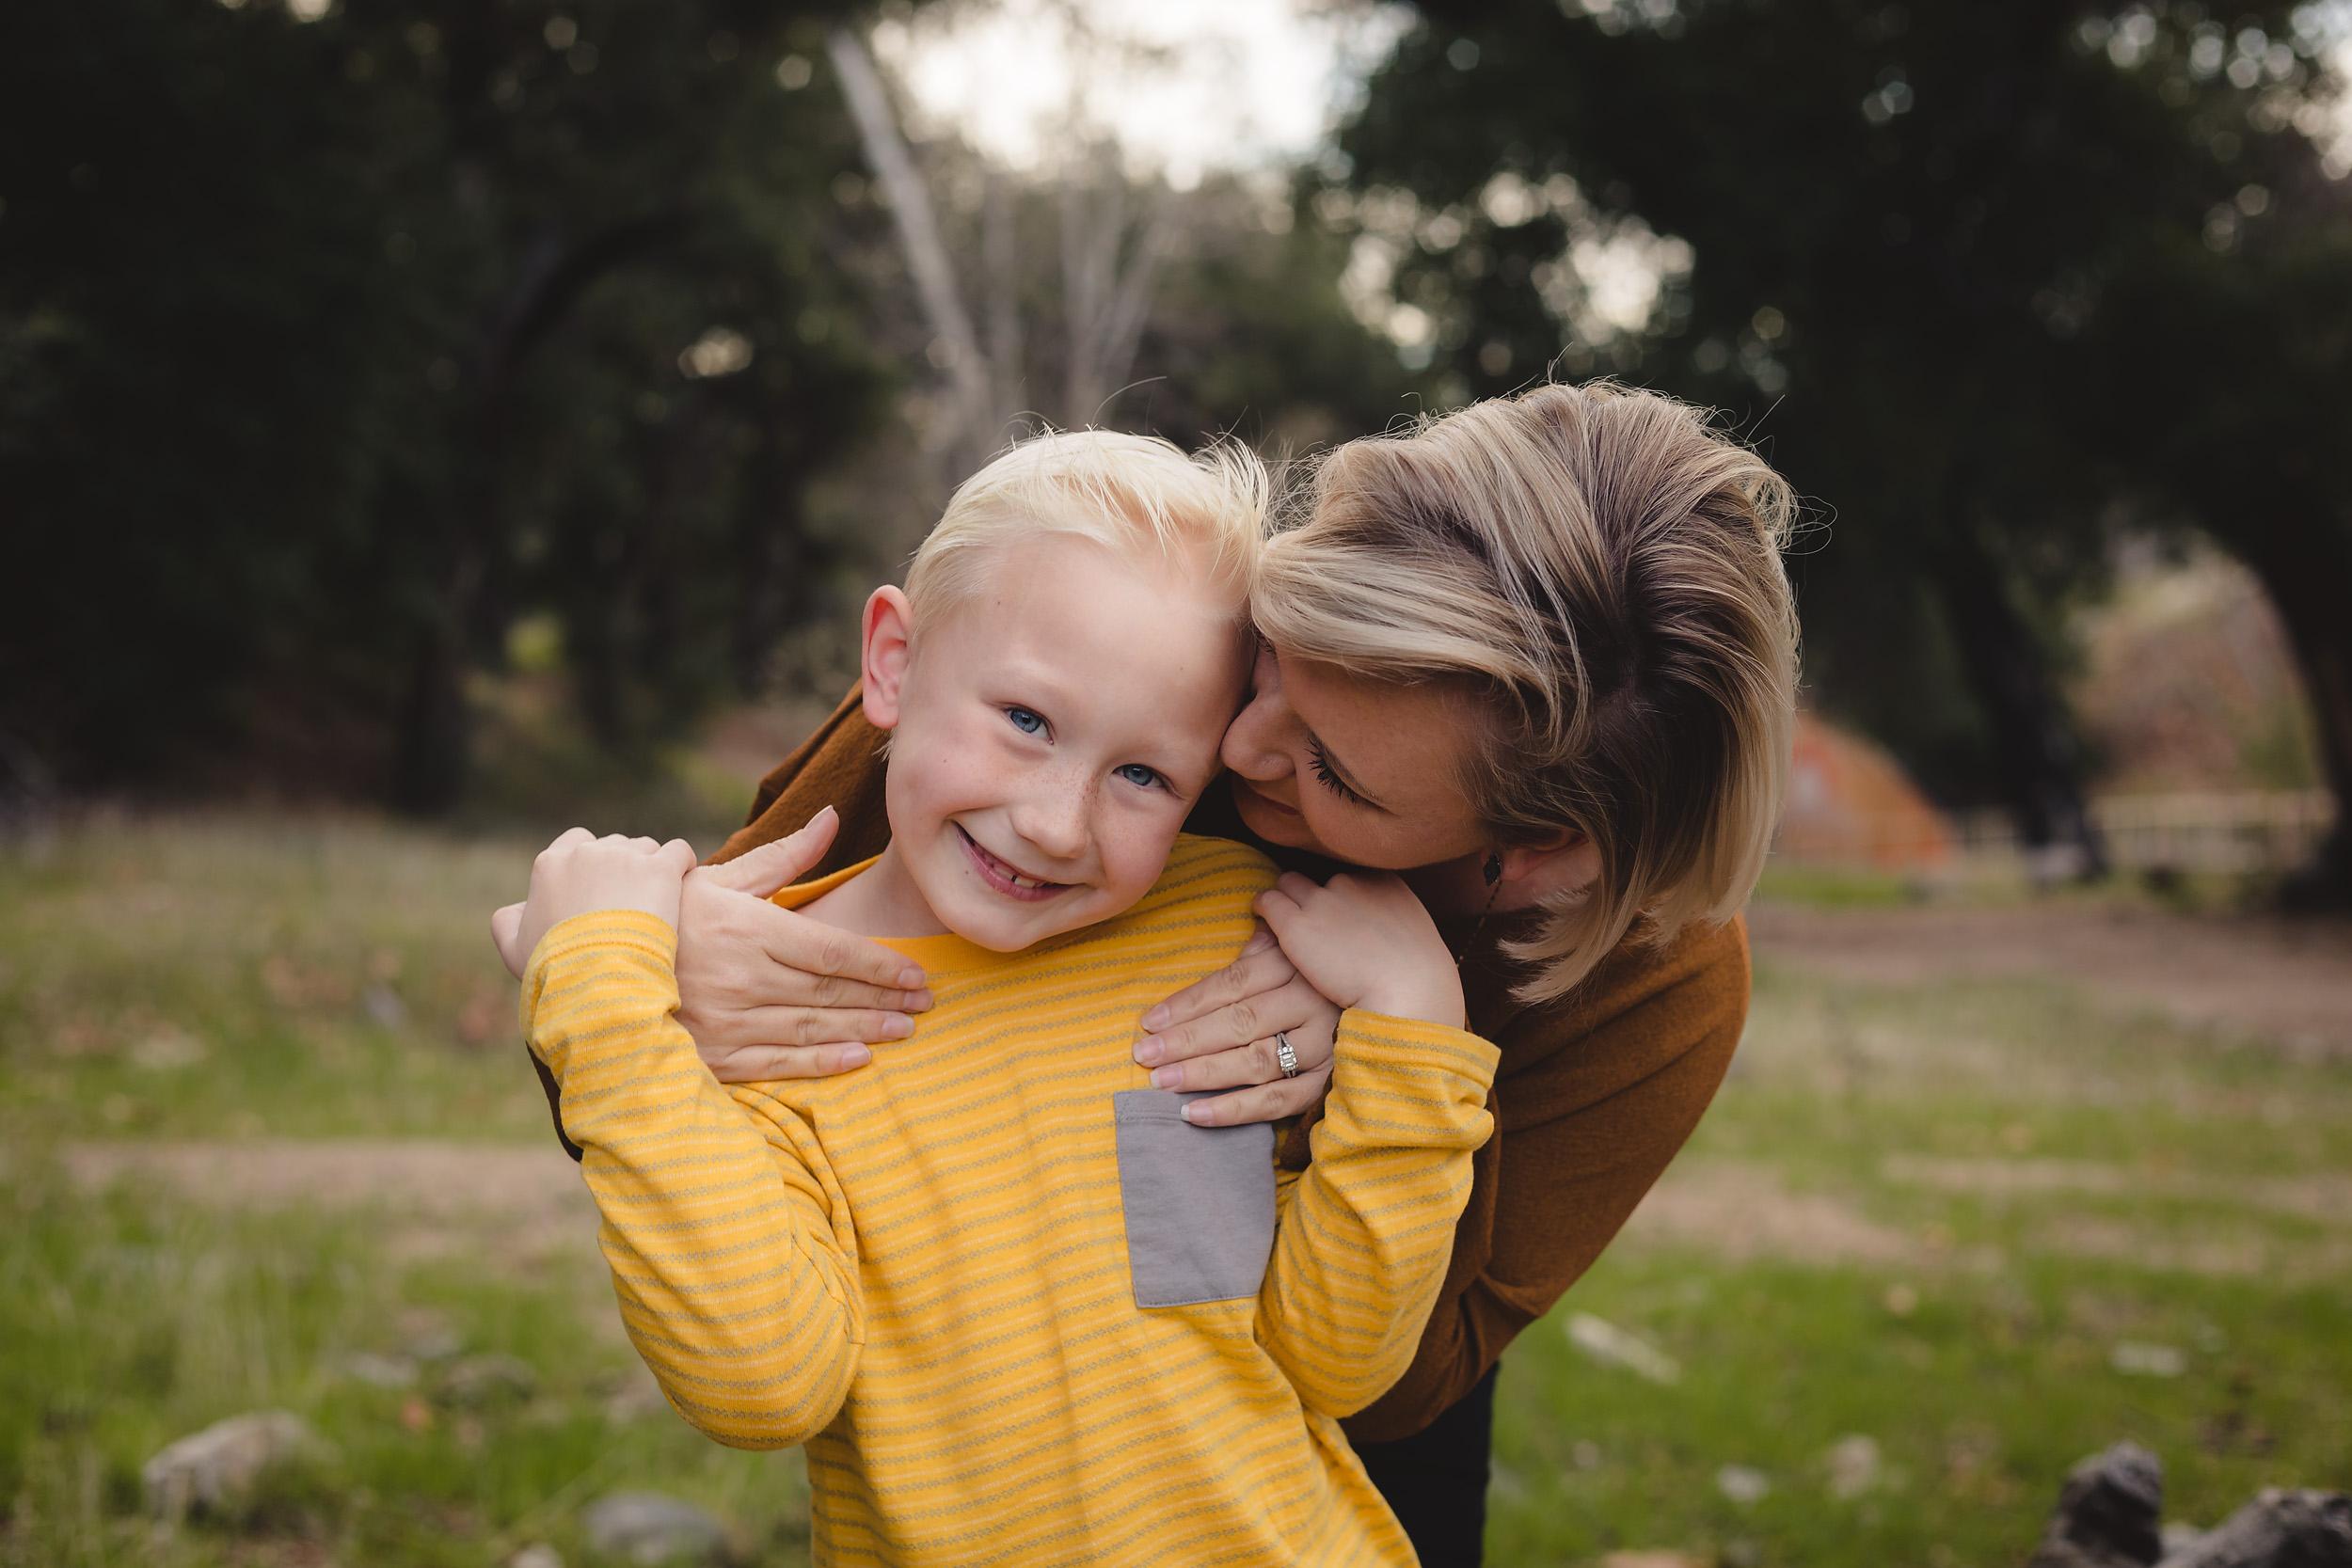 Pitts Family Portraits - 0088 - 8485 - 20190120 - Scott Madrigal Photography.jpg